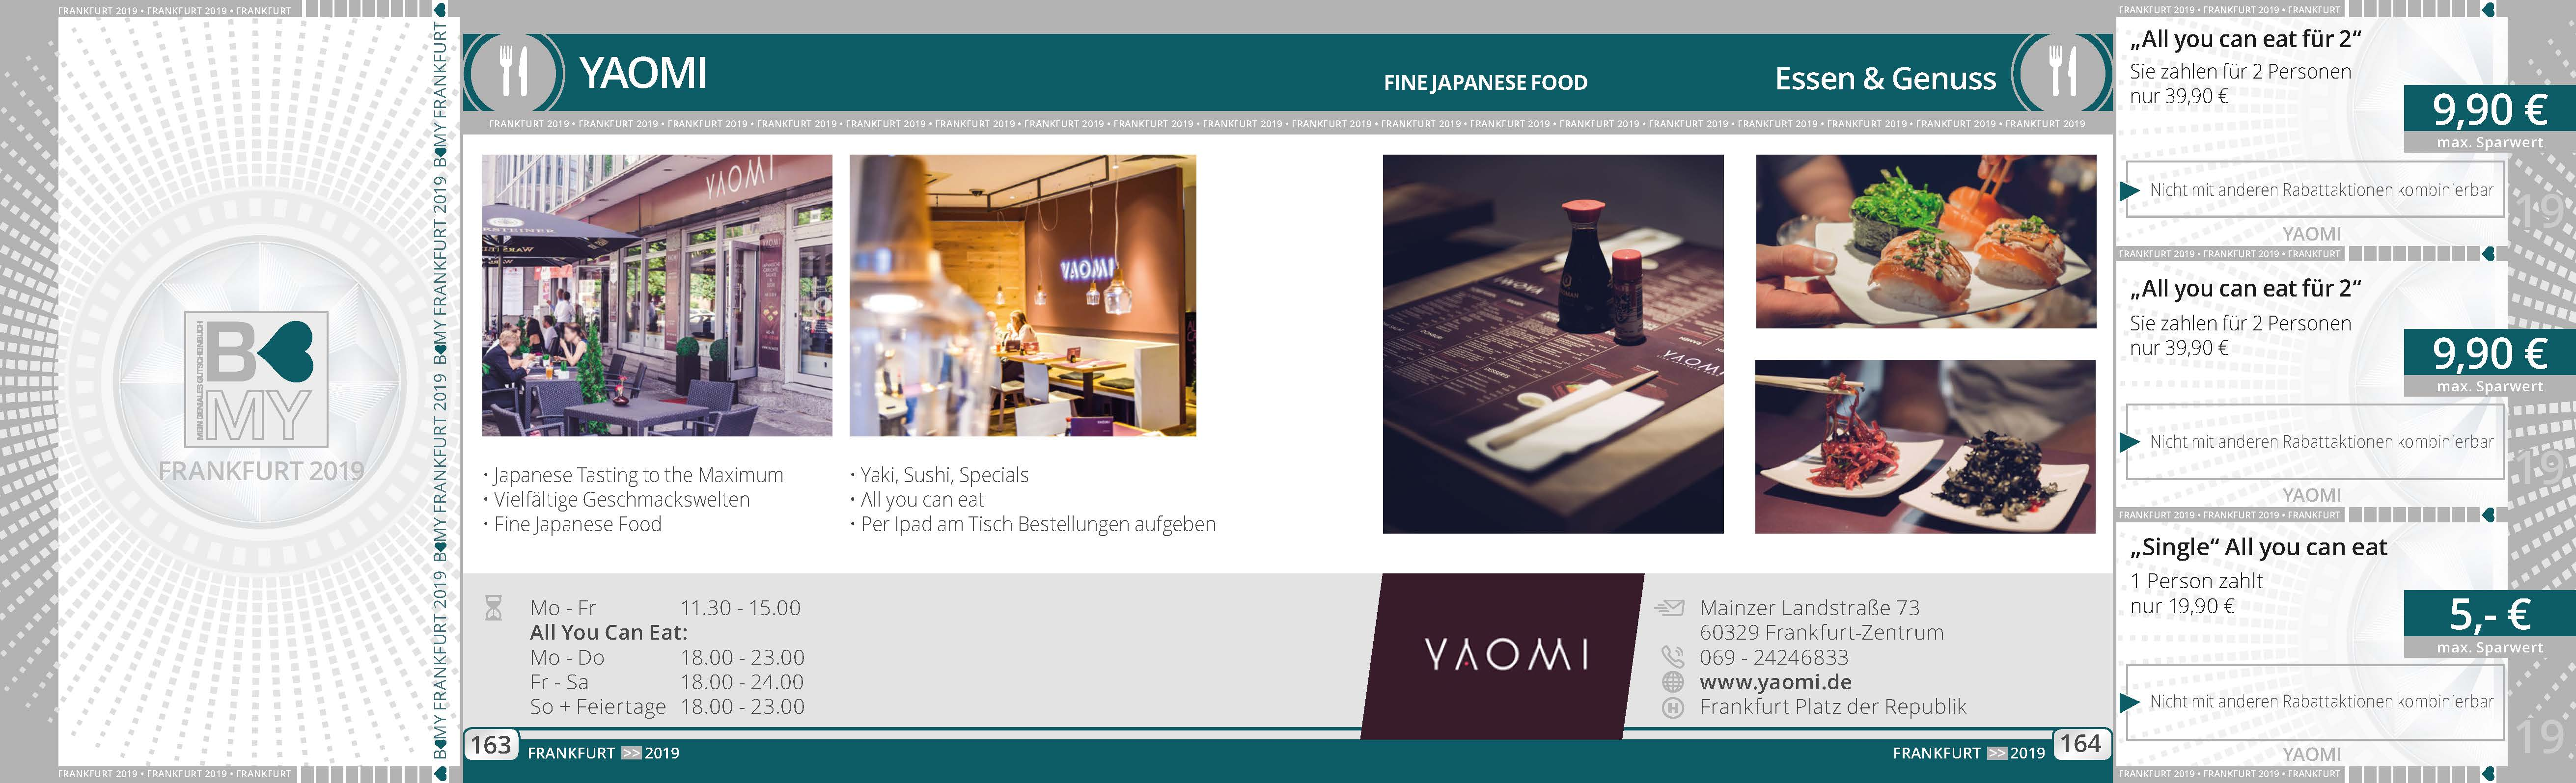 yaomi essen genuss partner 2019. Black Bedroom Furniture Sets. Home Design Ideas